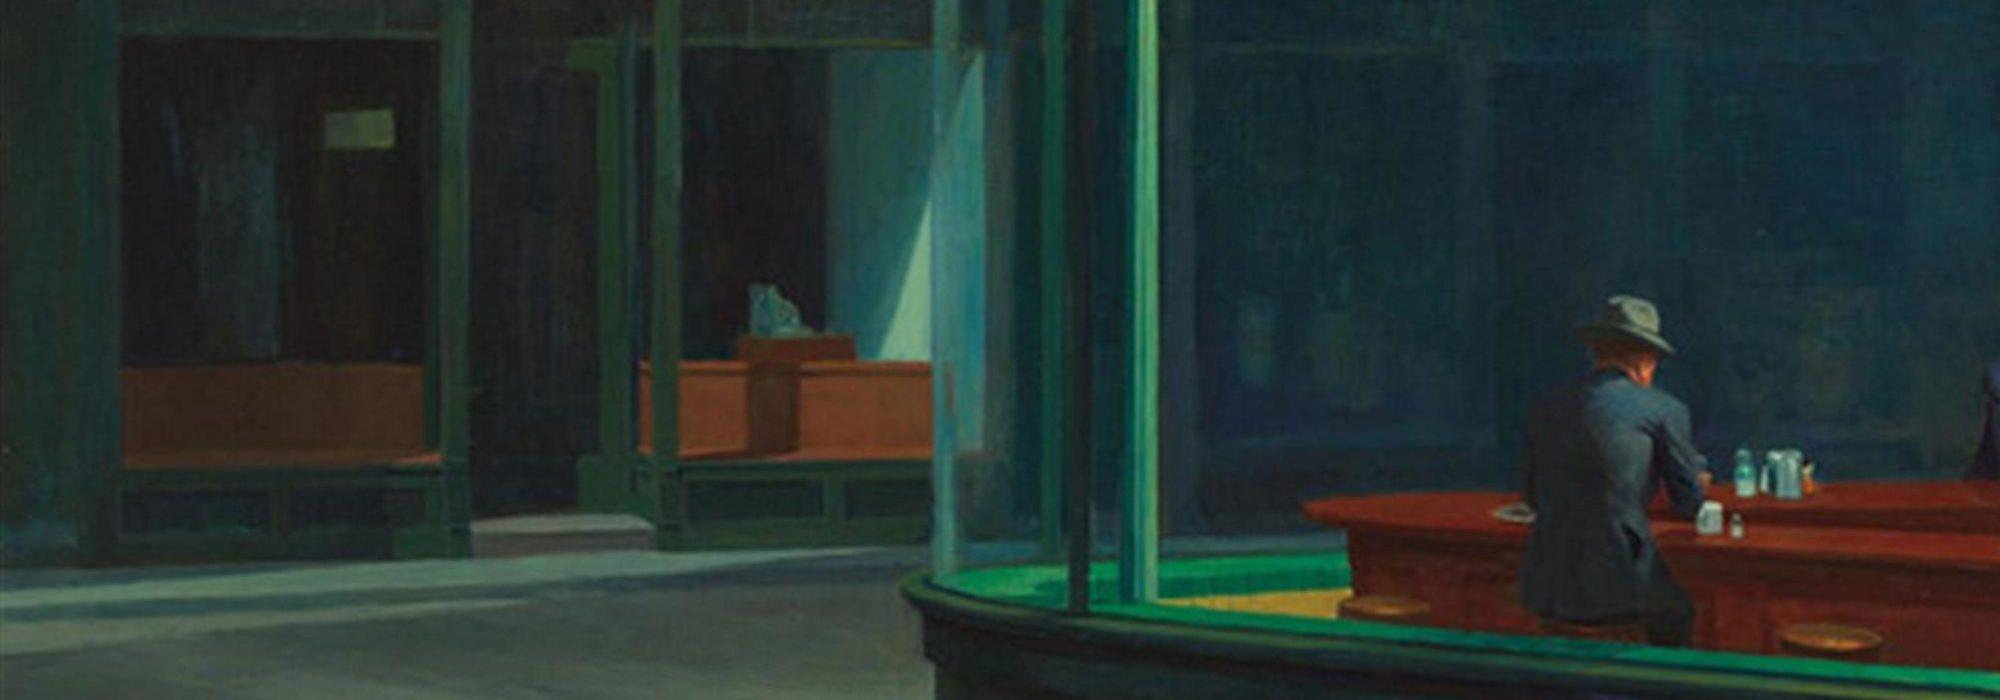 Imagem: Nighthawks (Edward Hopper, detalhe)